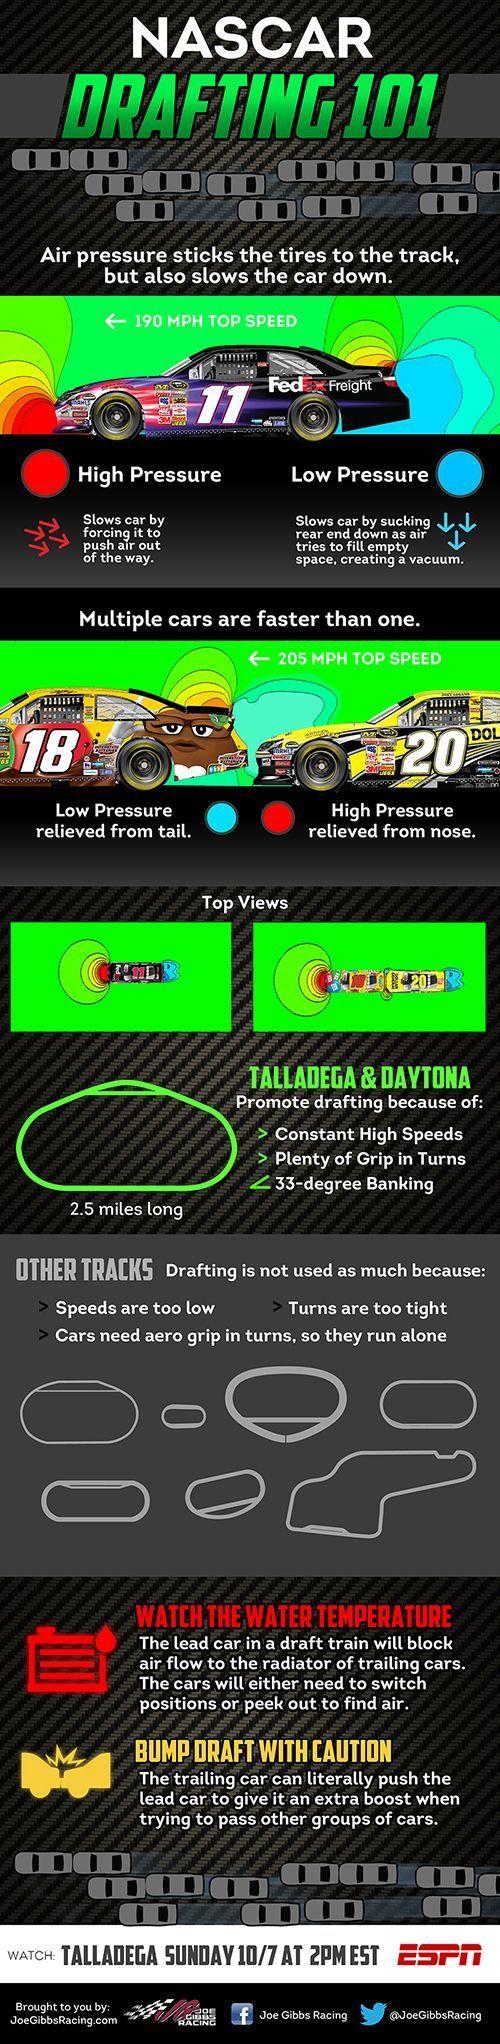 NASCAR Drafting 101.